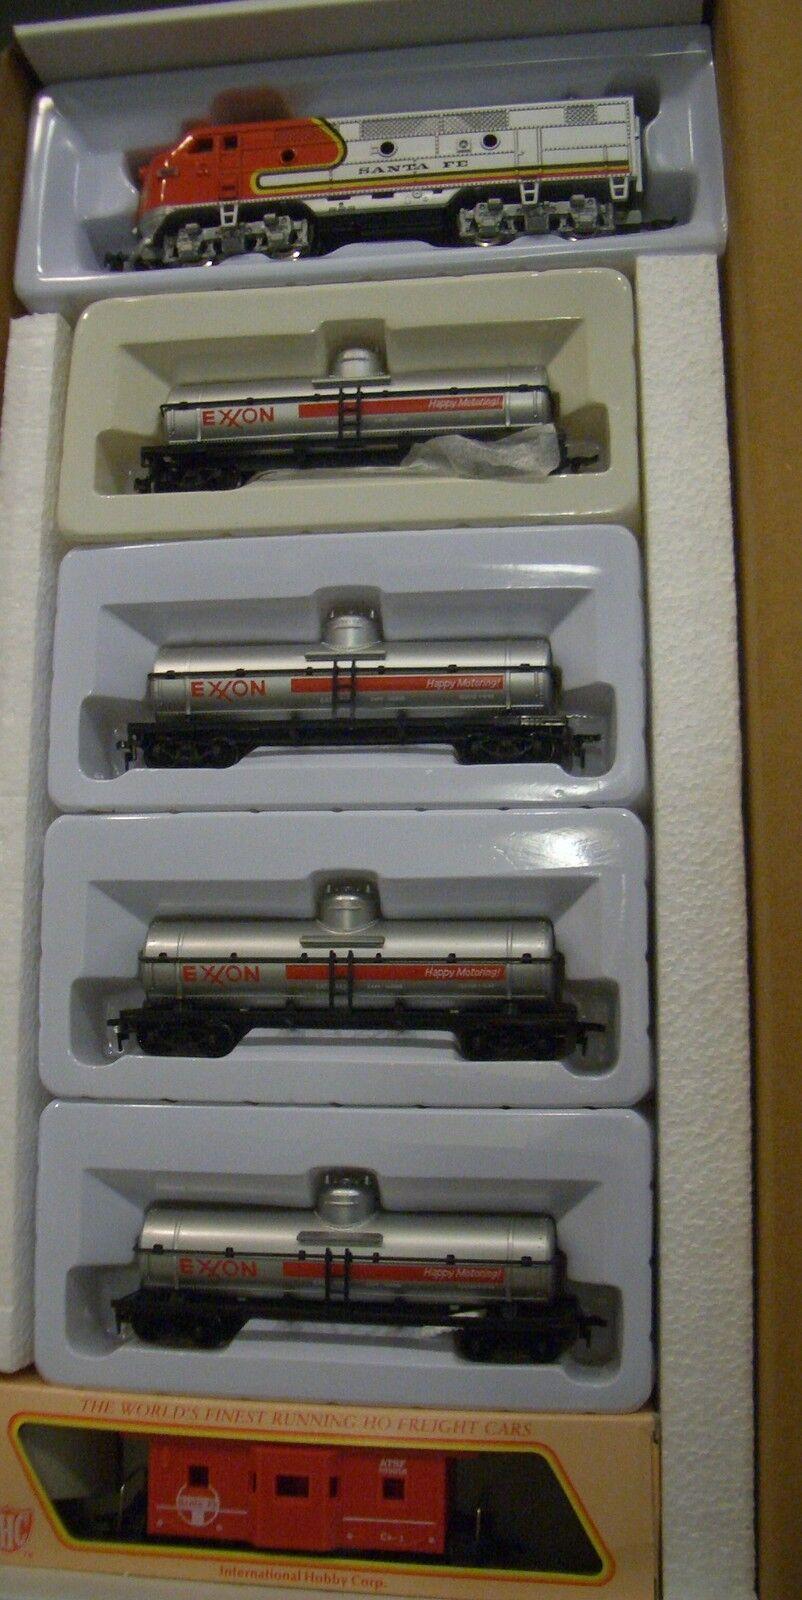 Ho Tren Set Santa Fe F-2 Loco 4 Autos Clásico Exxon vagones-cisterna & Caboose rr -400